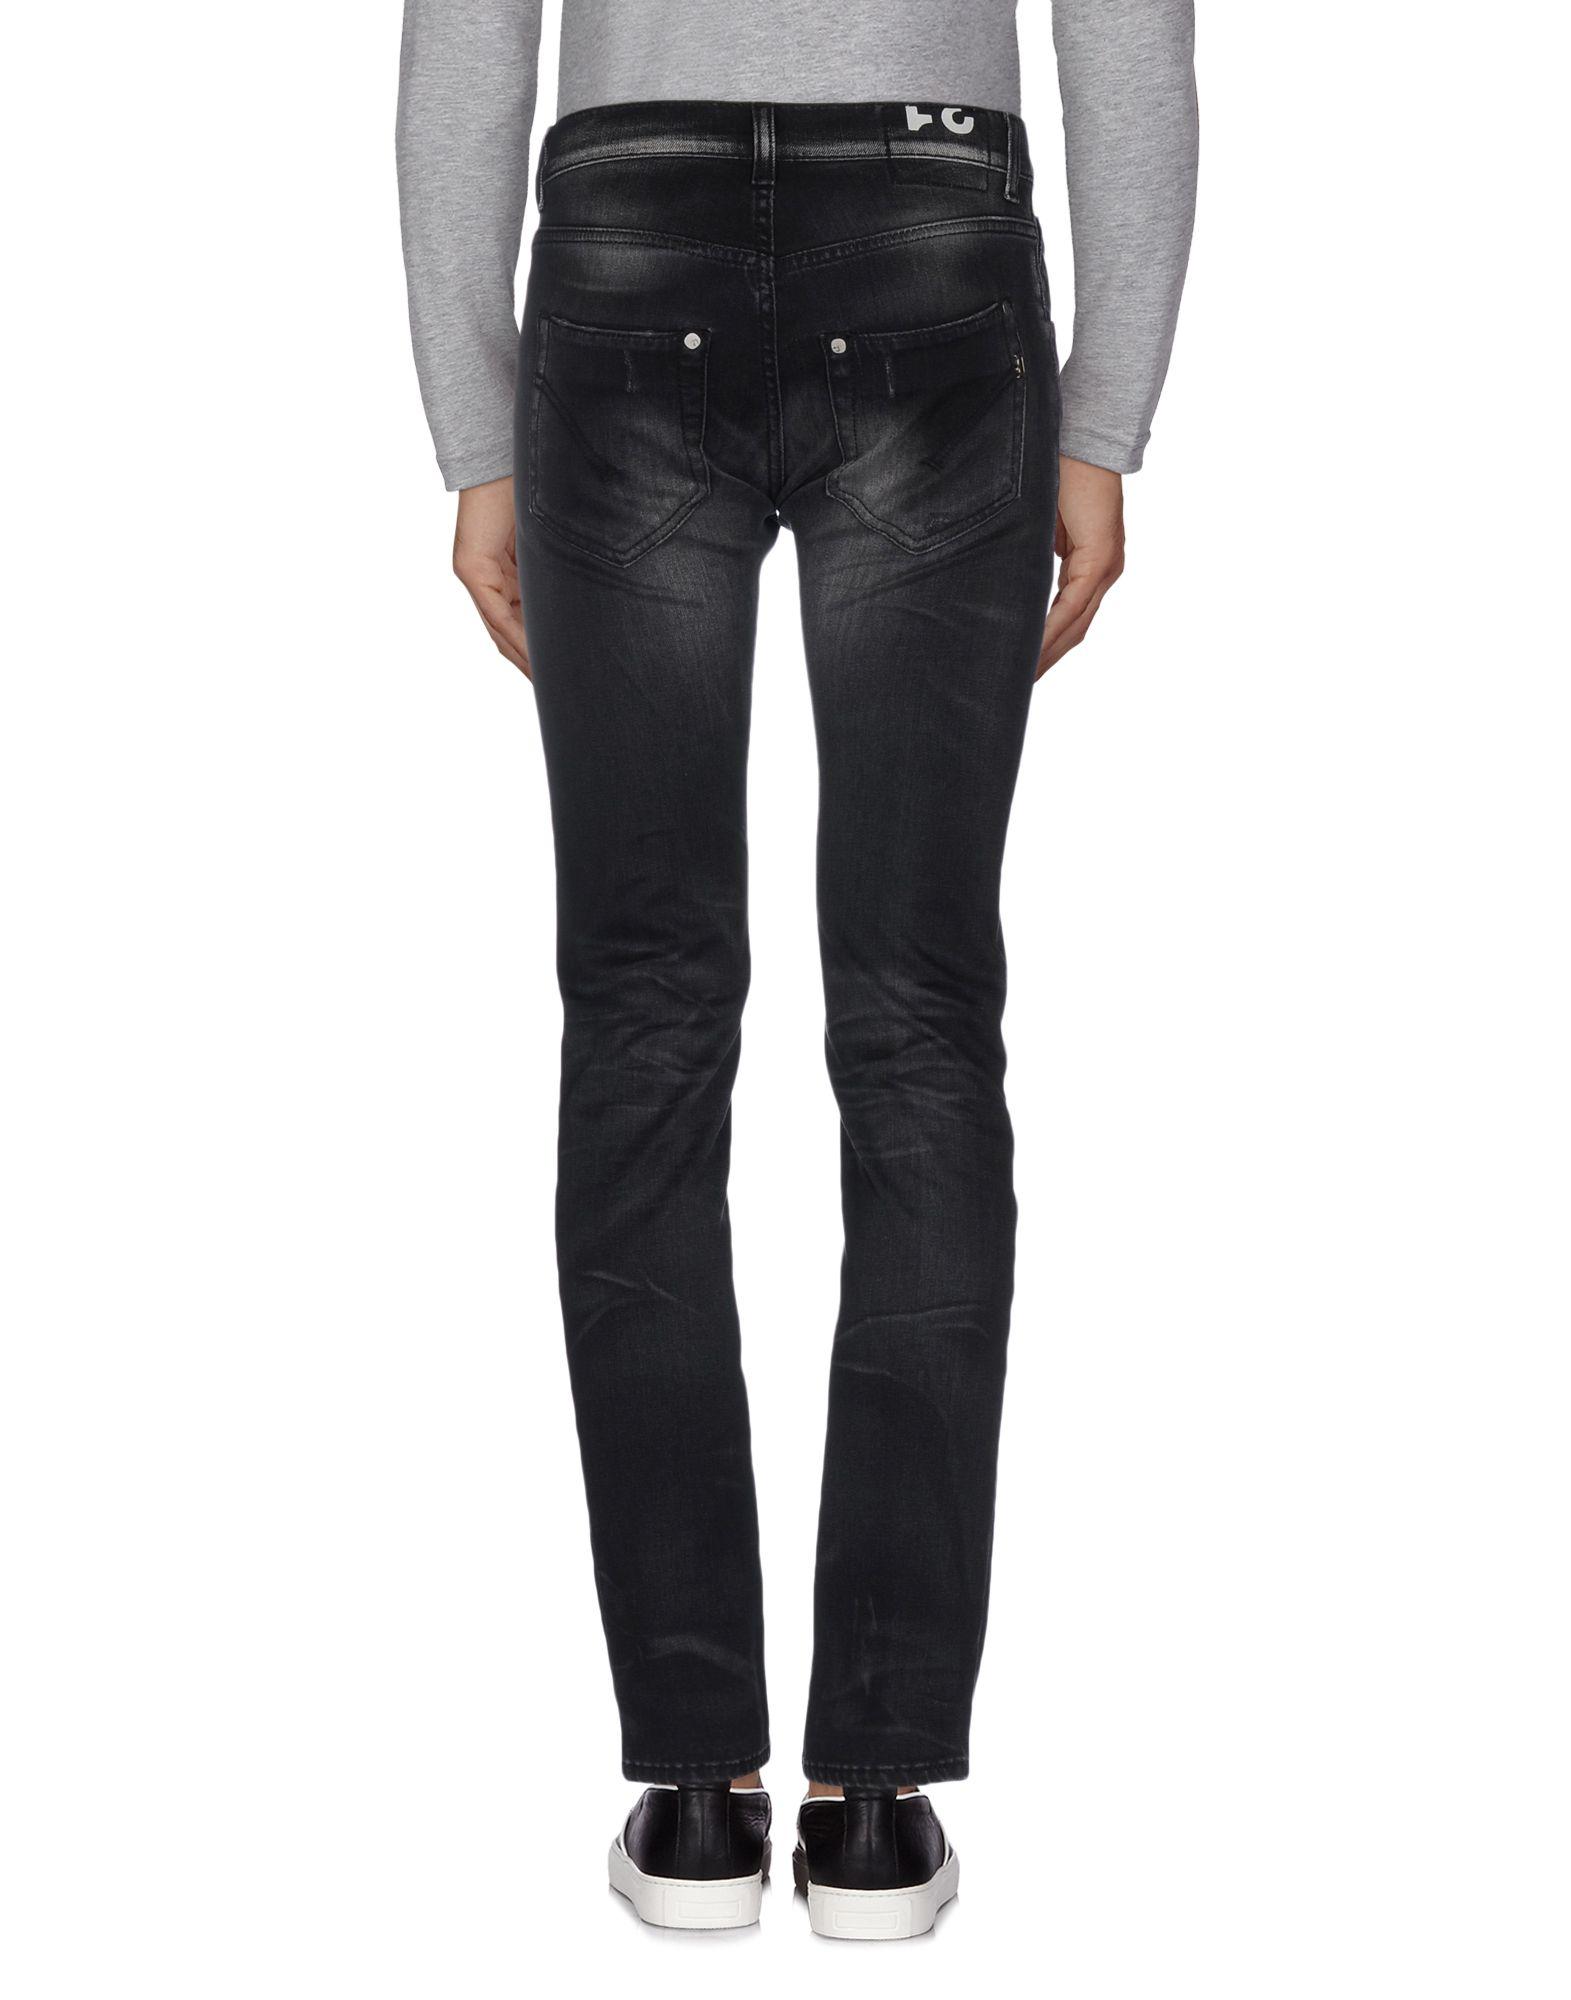 Pantaloni - Jeans Dondup Uomo - Pantaloni 42485735WQ 504484